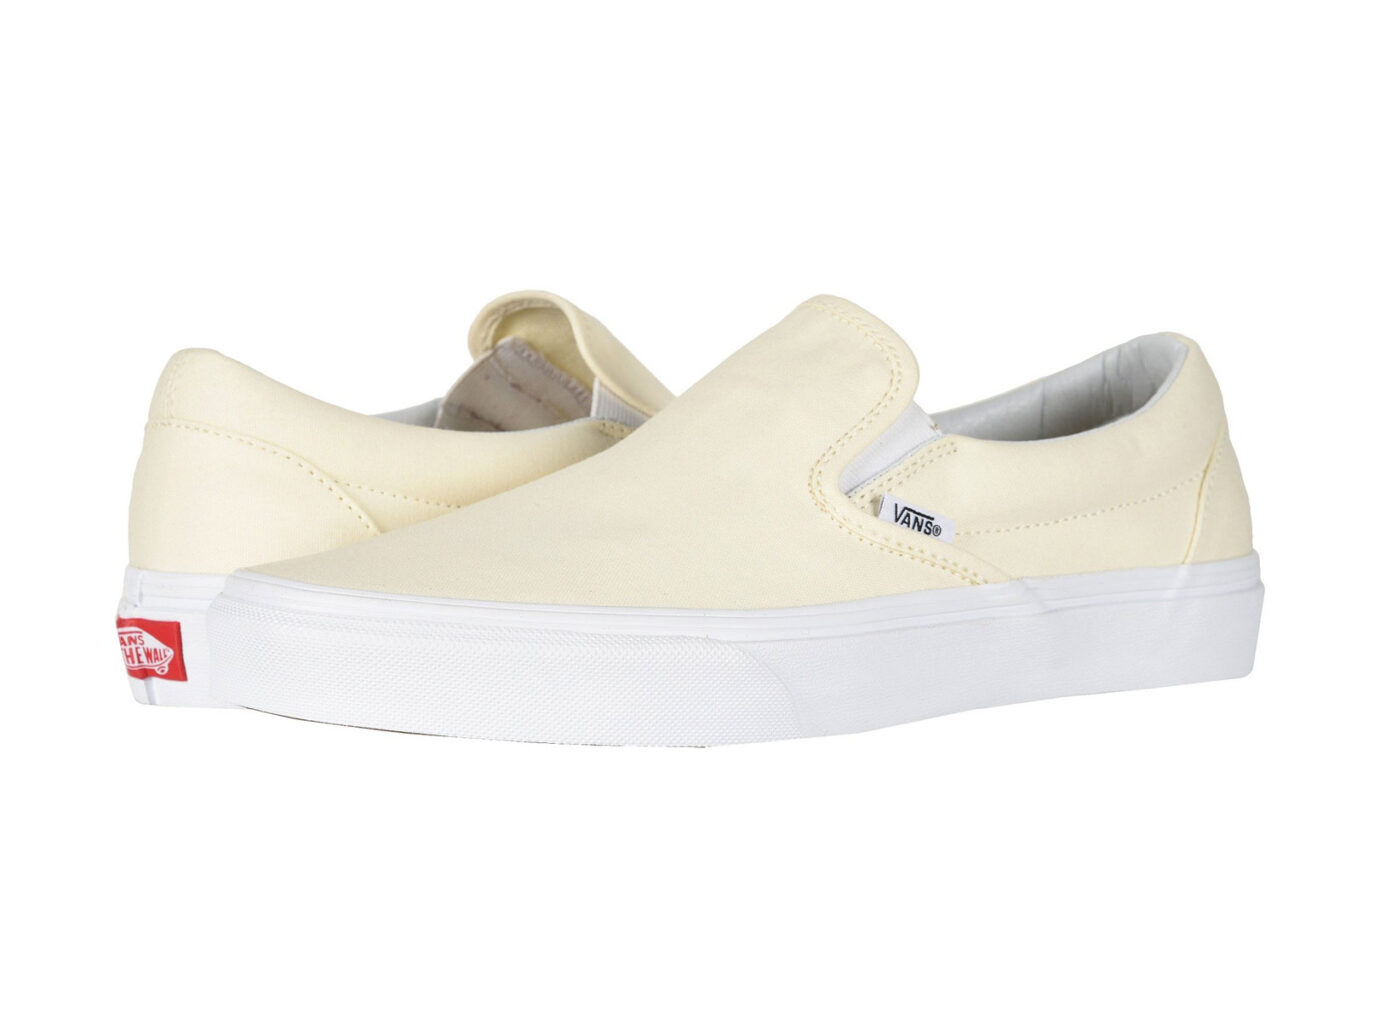 Vans Classic Slip-Ons